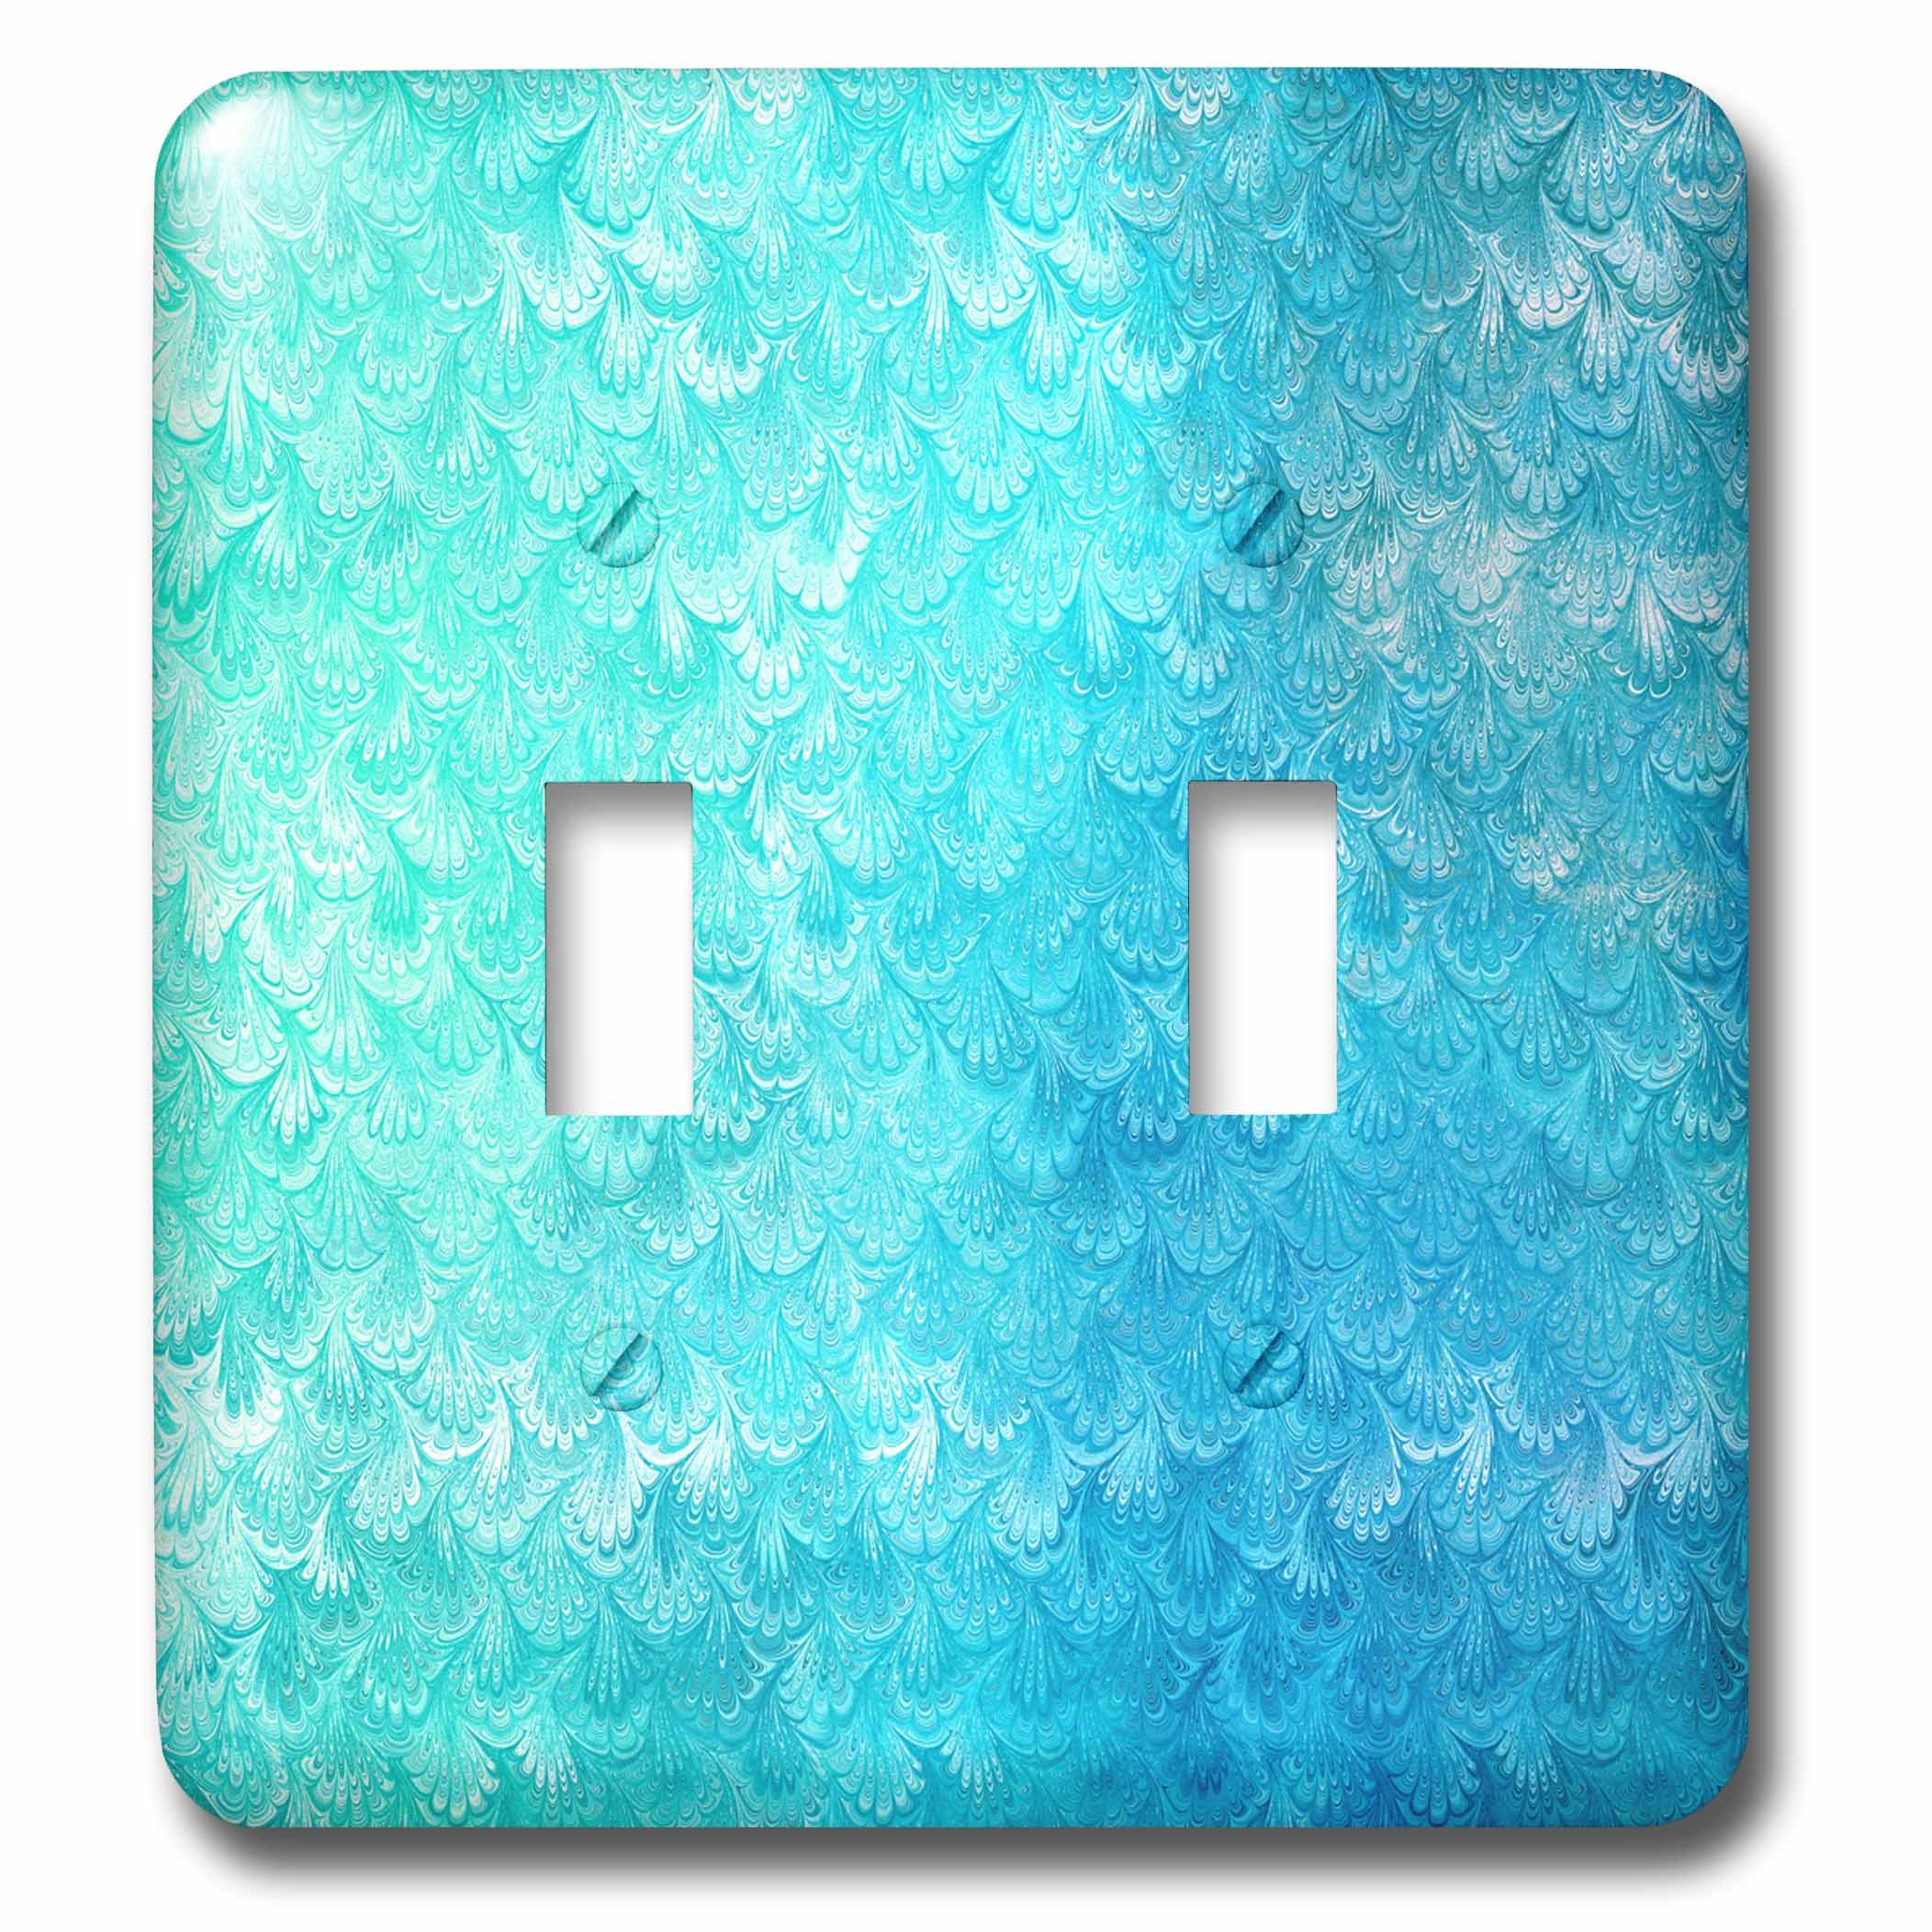 3dRose Uta Naumann Faux Glitter Pattern - Girly Trend Teal Blue Luxury Elegant Mermaid Scales Glitter Glamor - Light Switch Covers - double toggle switch (lsp_272870_2)